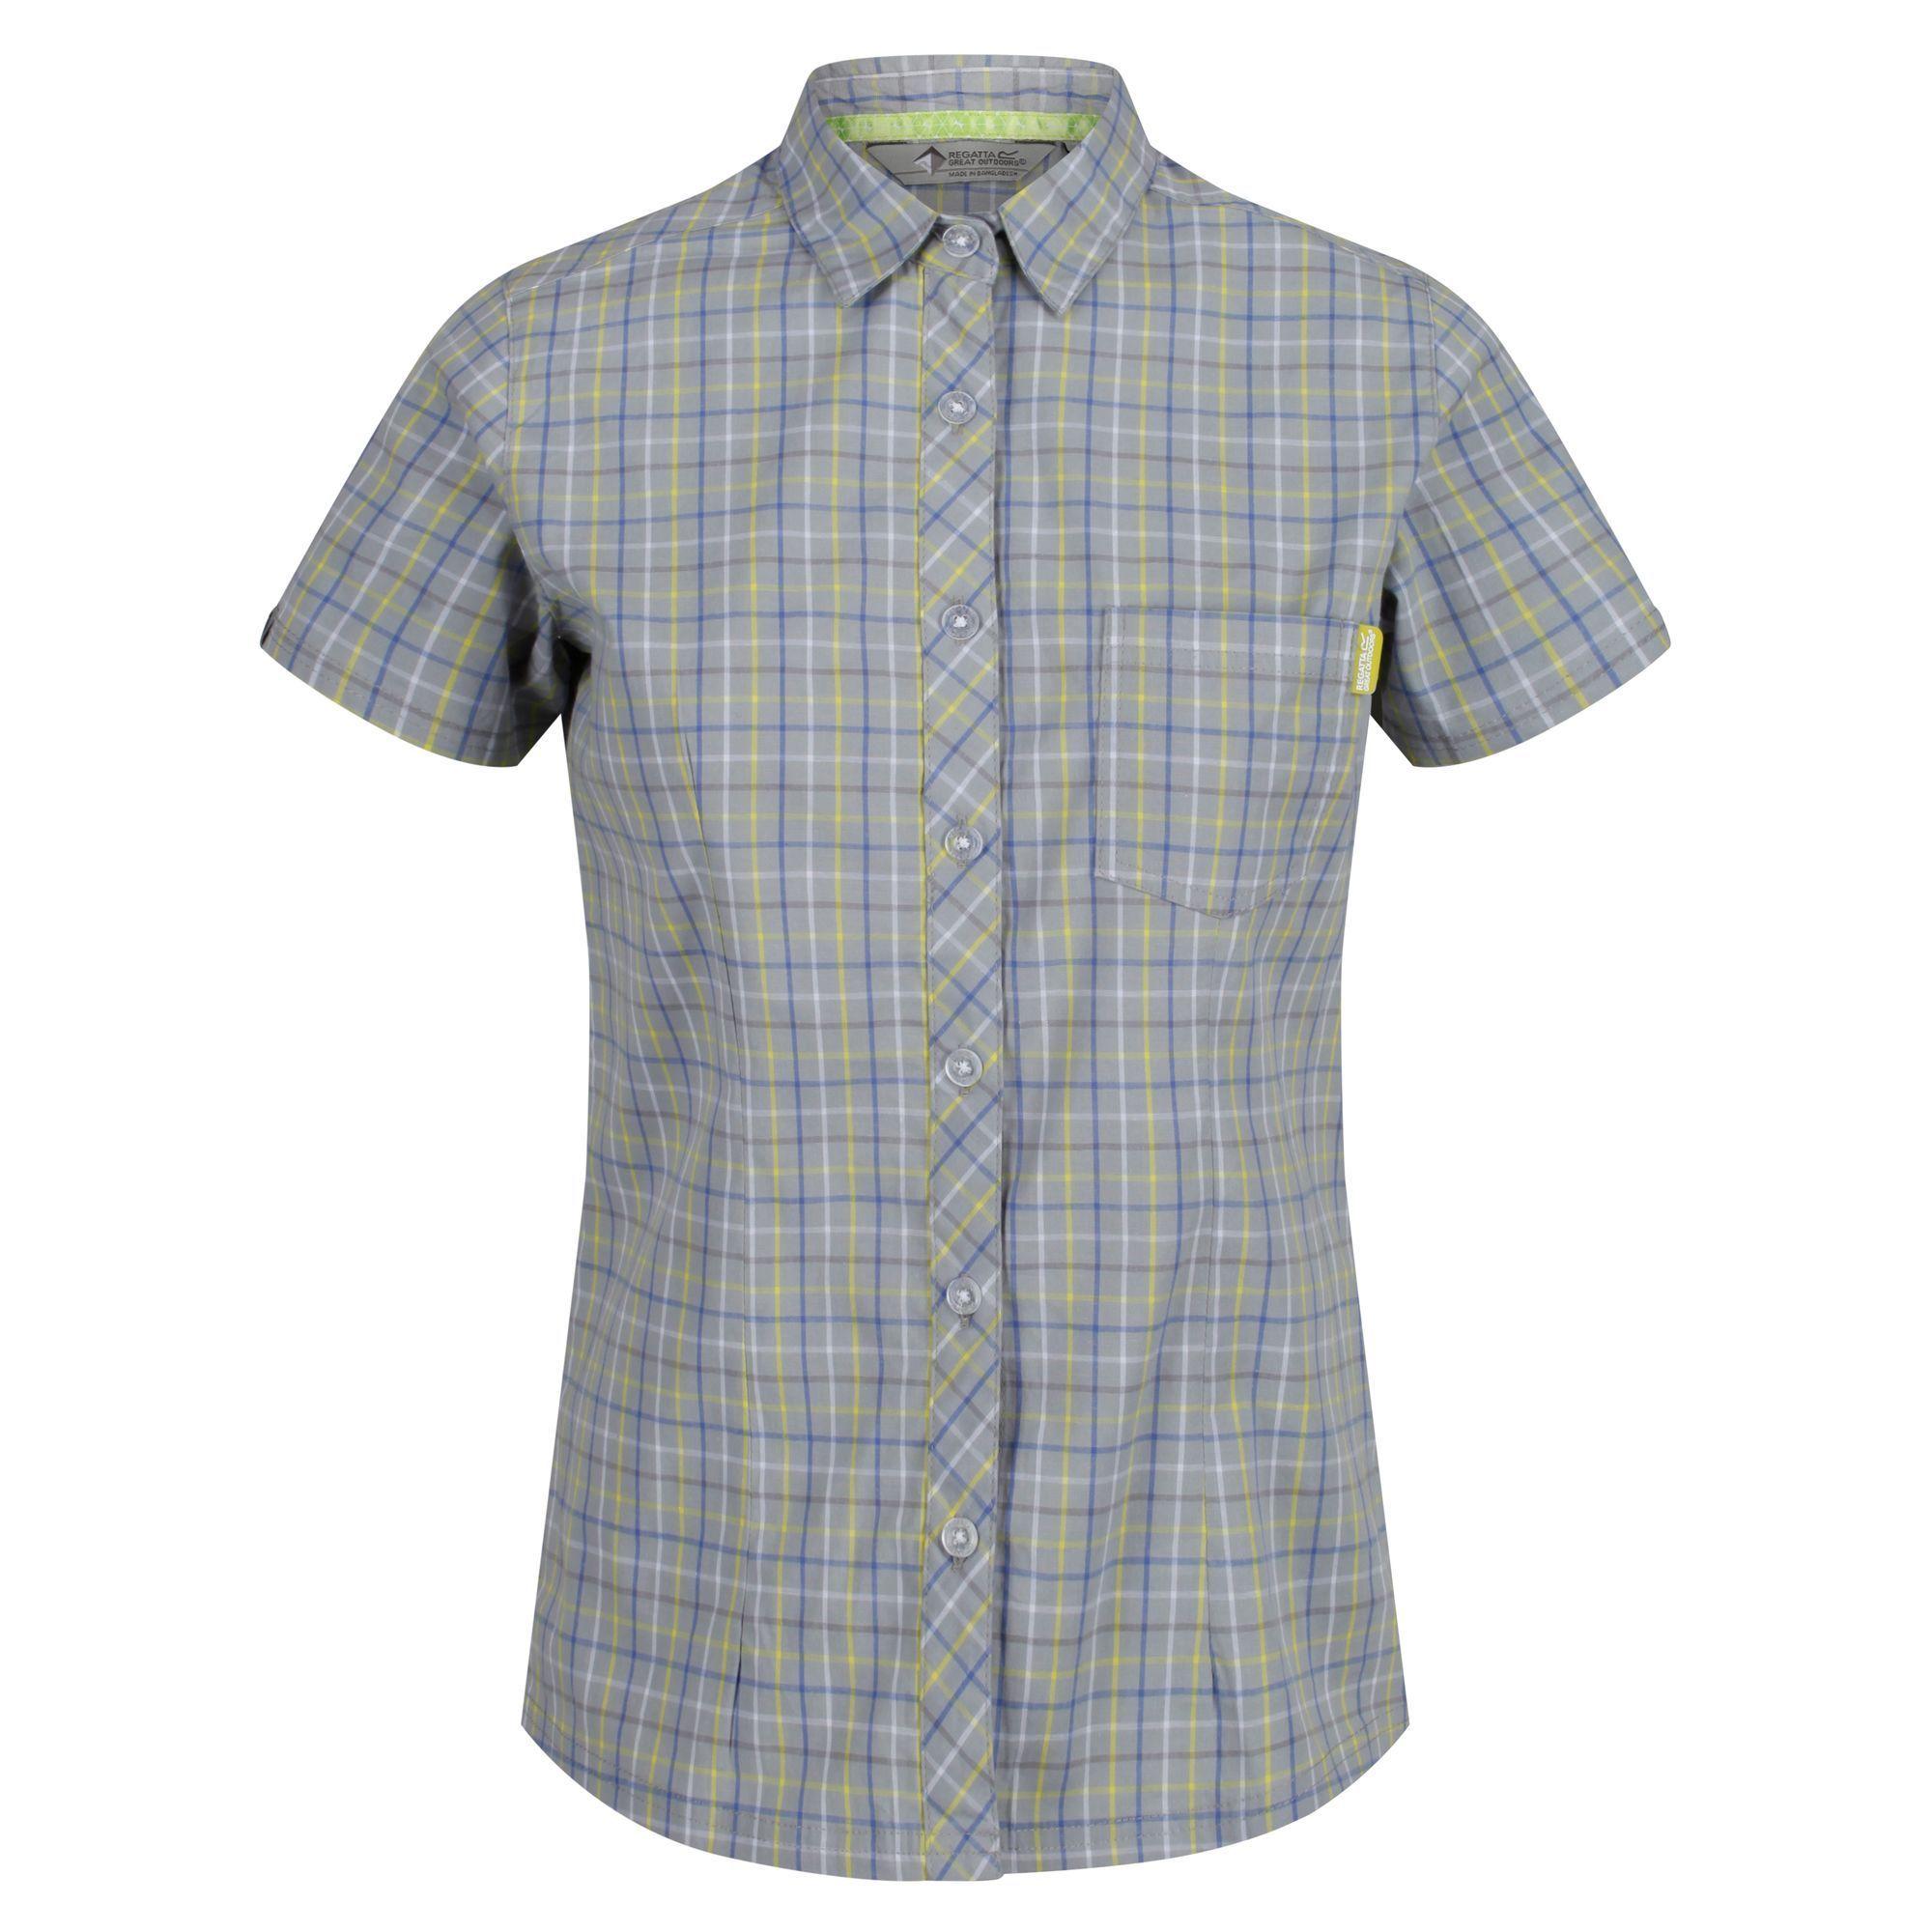 Regatta Womens/Ladies Honshu III Short Sleeve Check Shirt